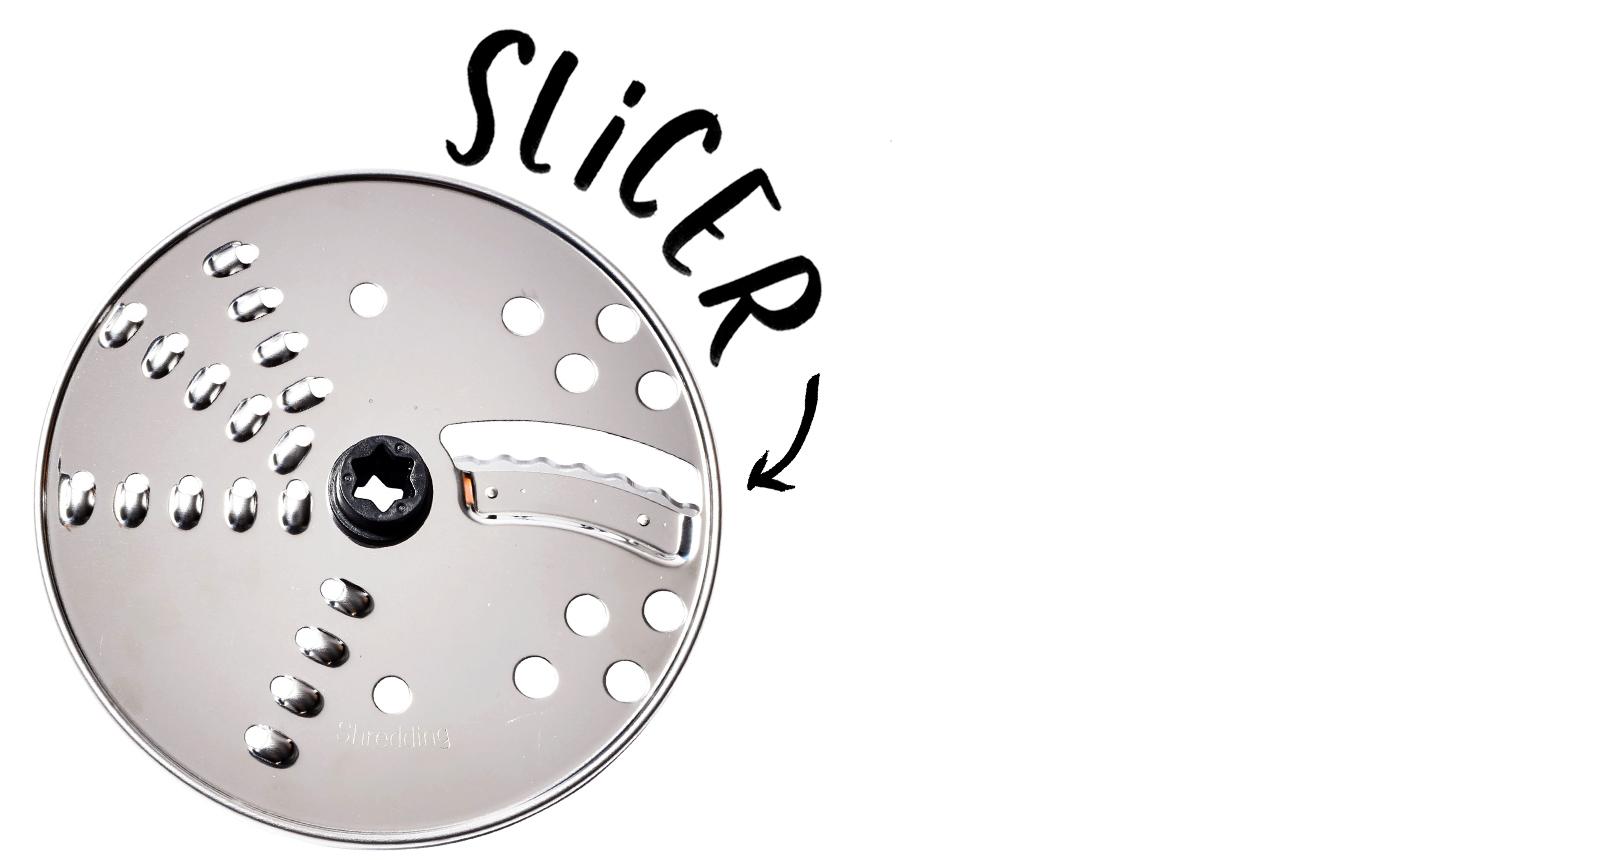 slicer-illustration-52419d1b-db3f5e4a